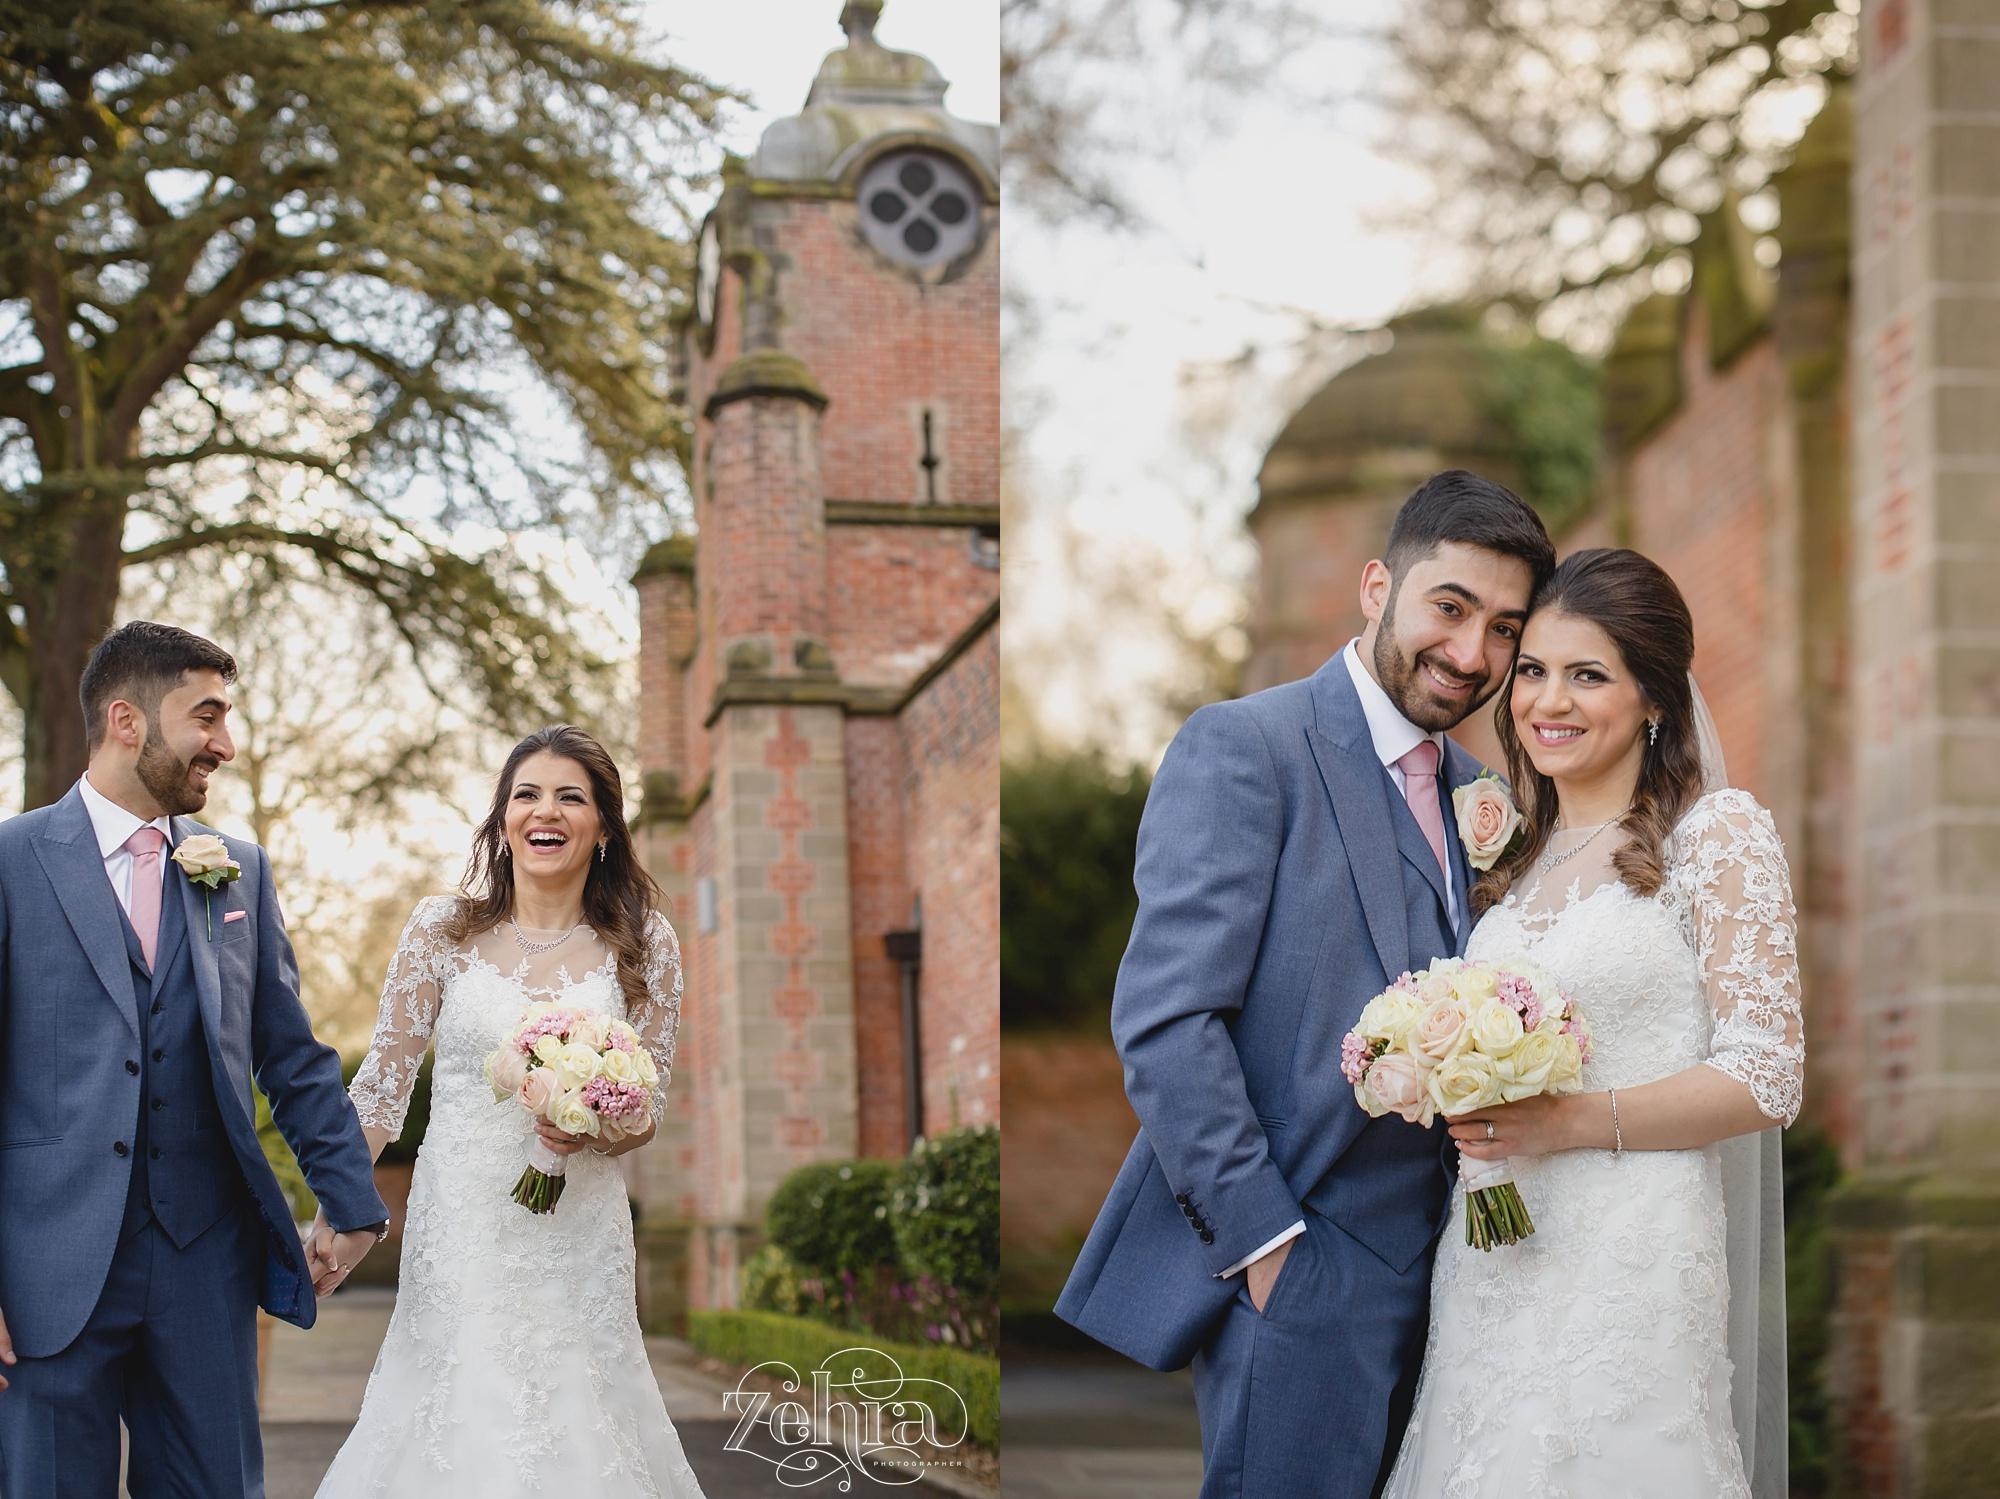 zehra photographer mere cheshire wedding_0019.jpg